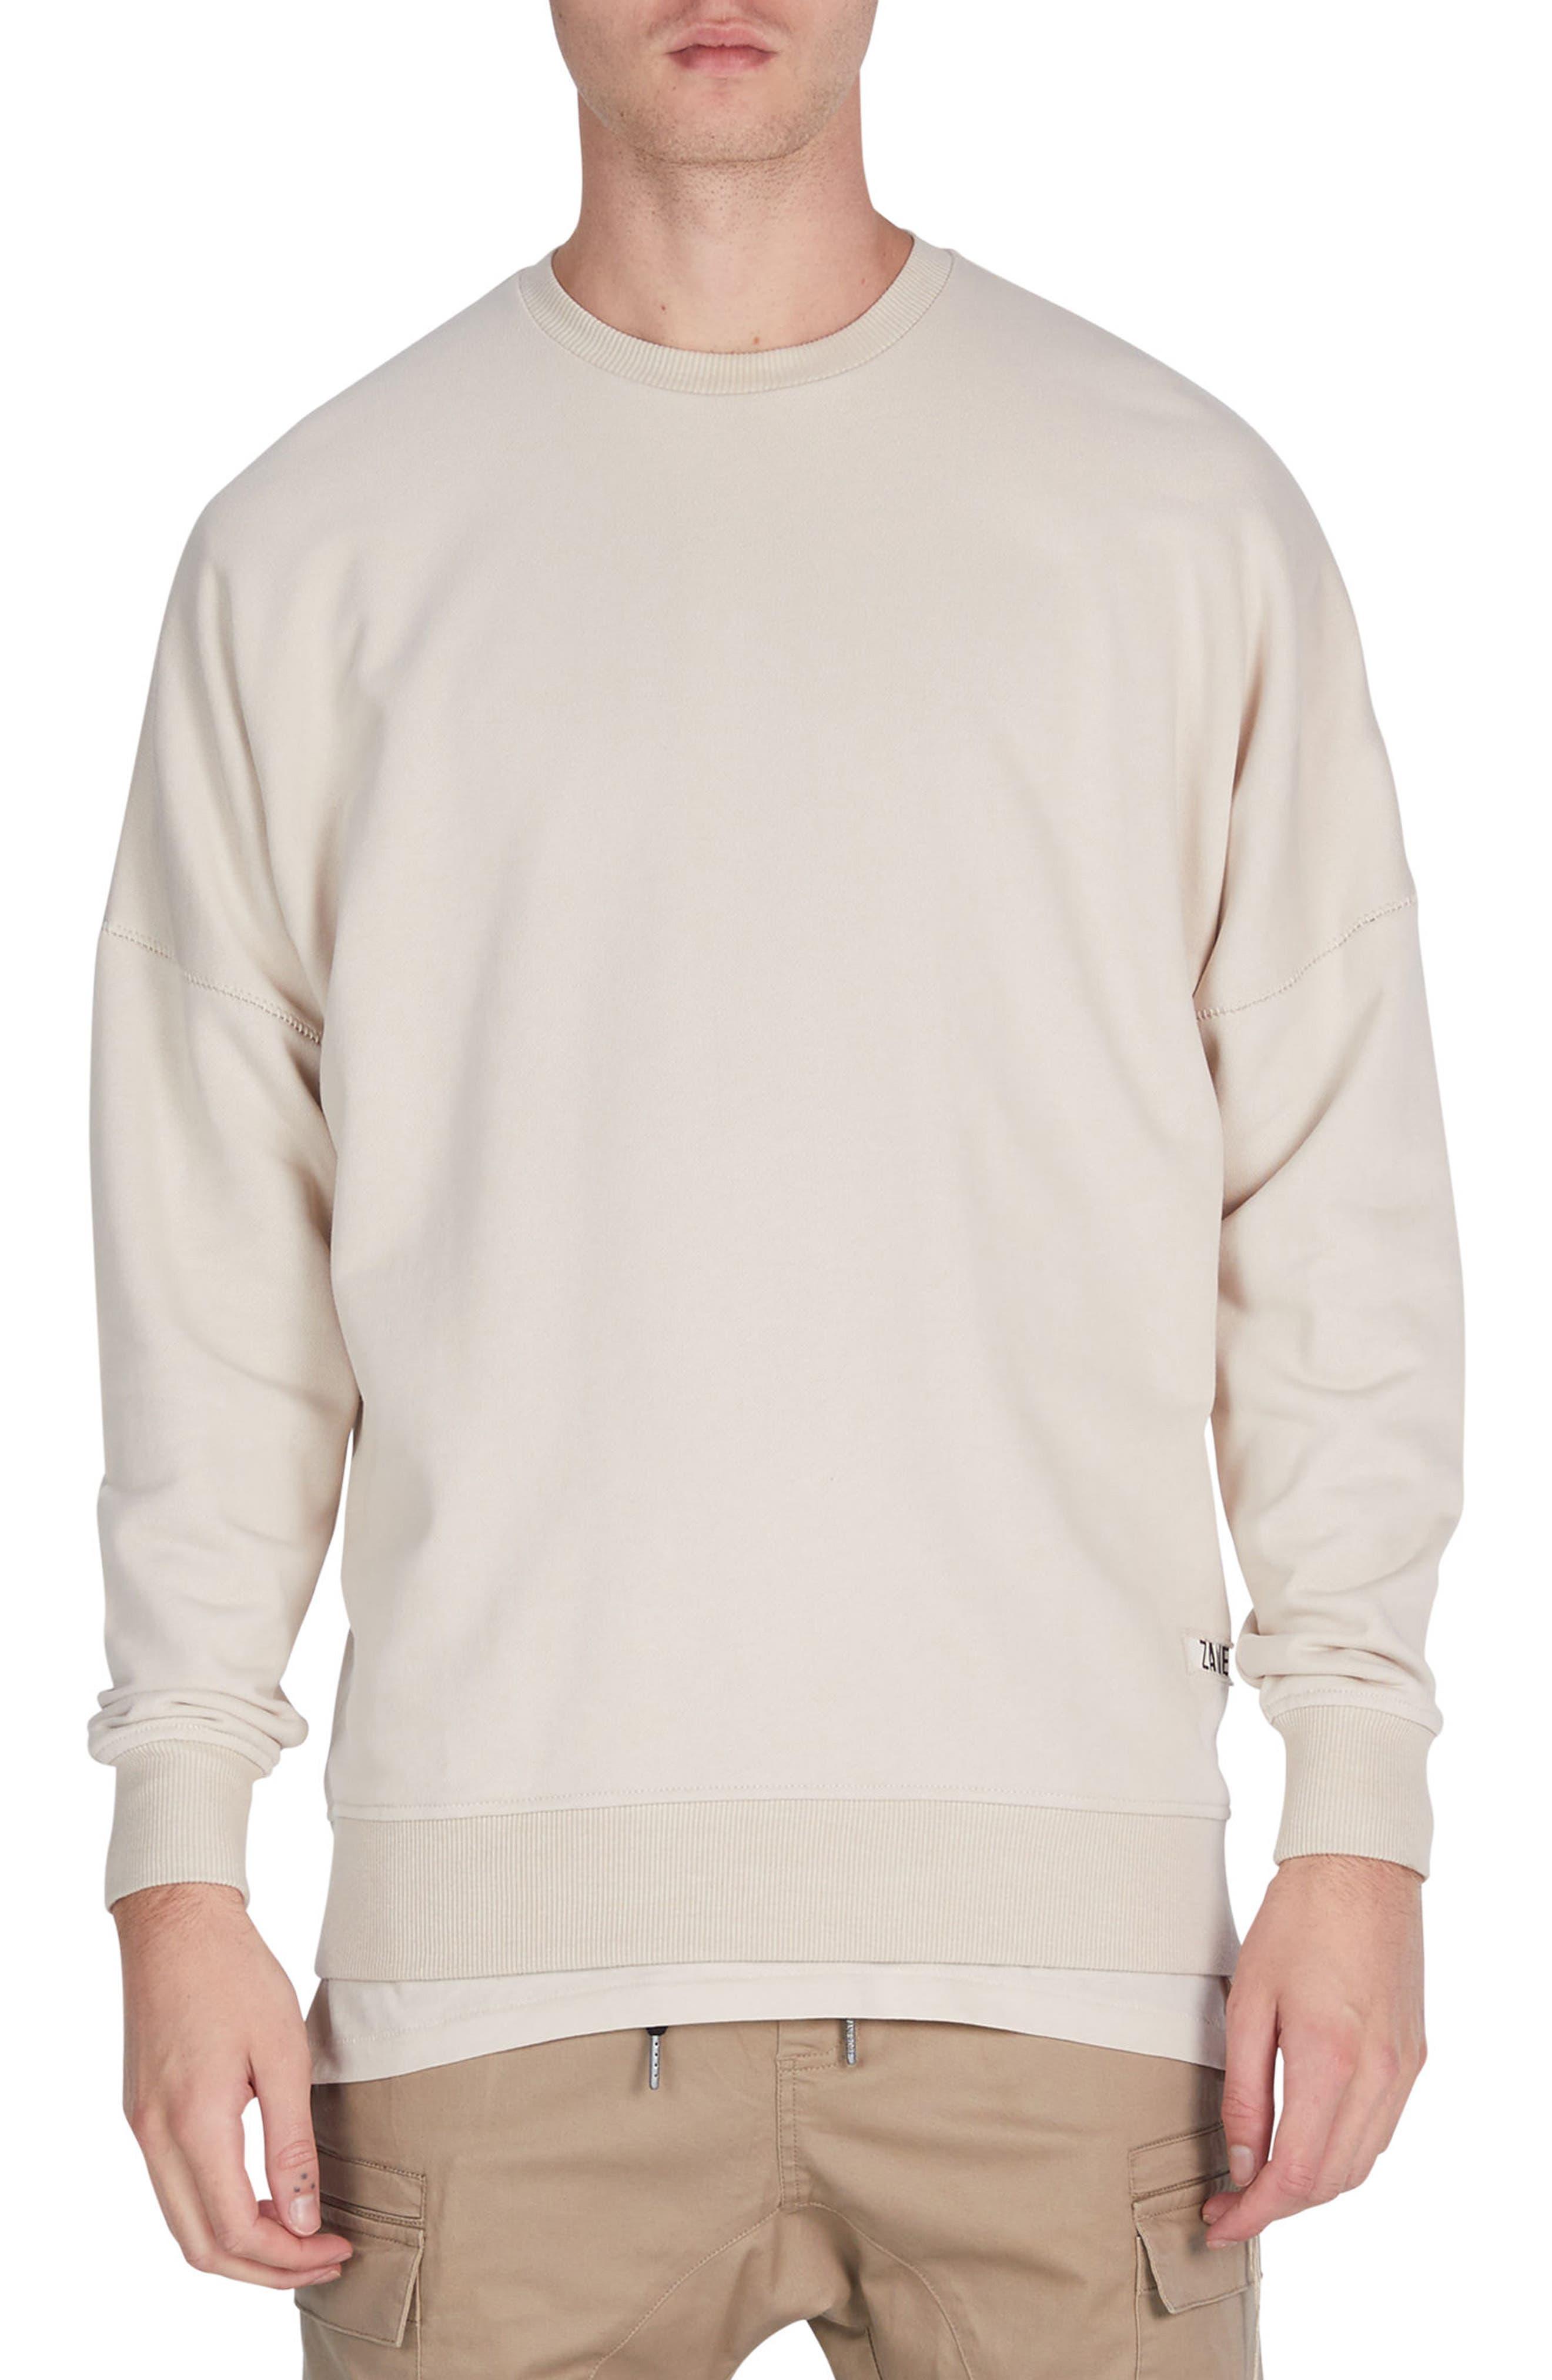 Rugger Crewneck Sweater,                             Main thumbnail 1, color,                             251